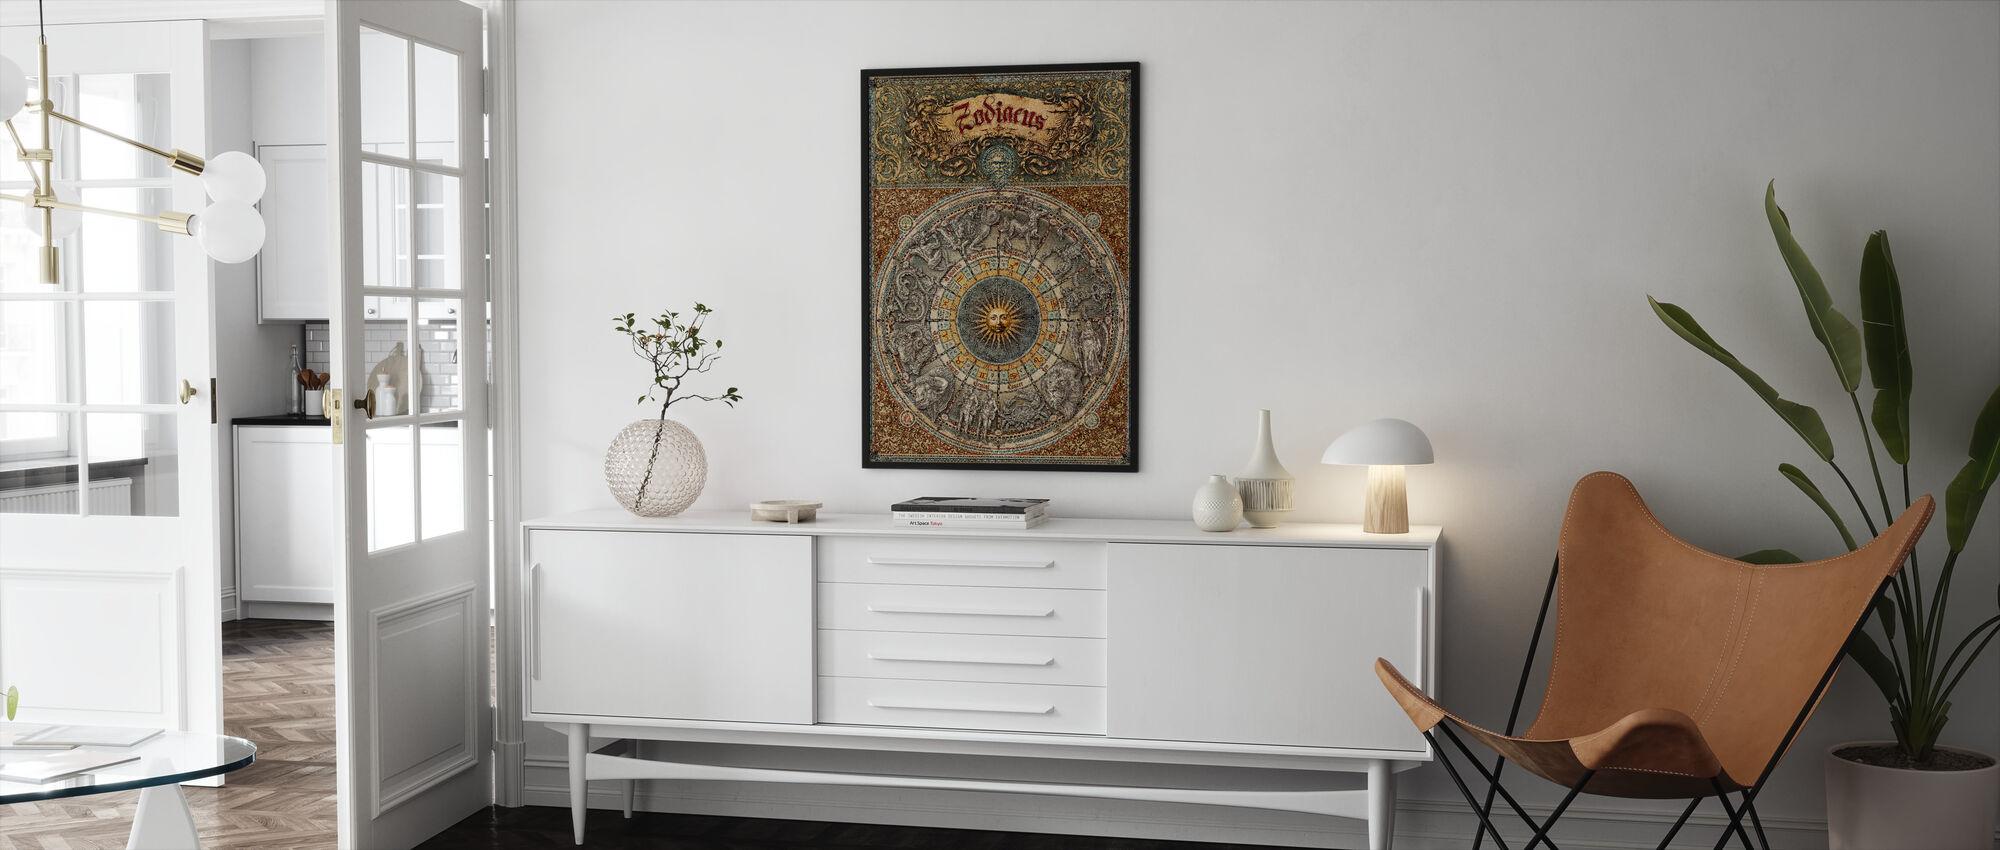 Zodiac - Innrammet bilde - Stue